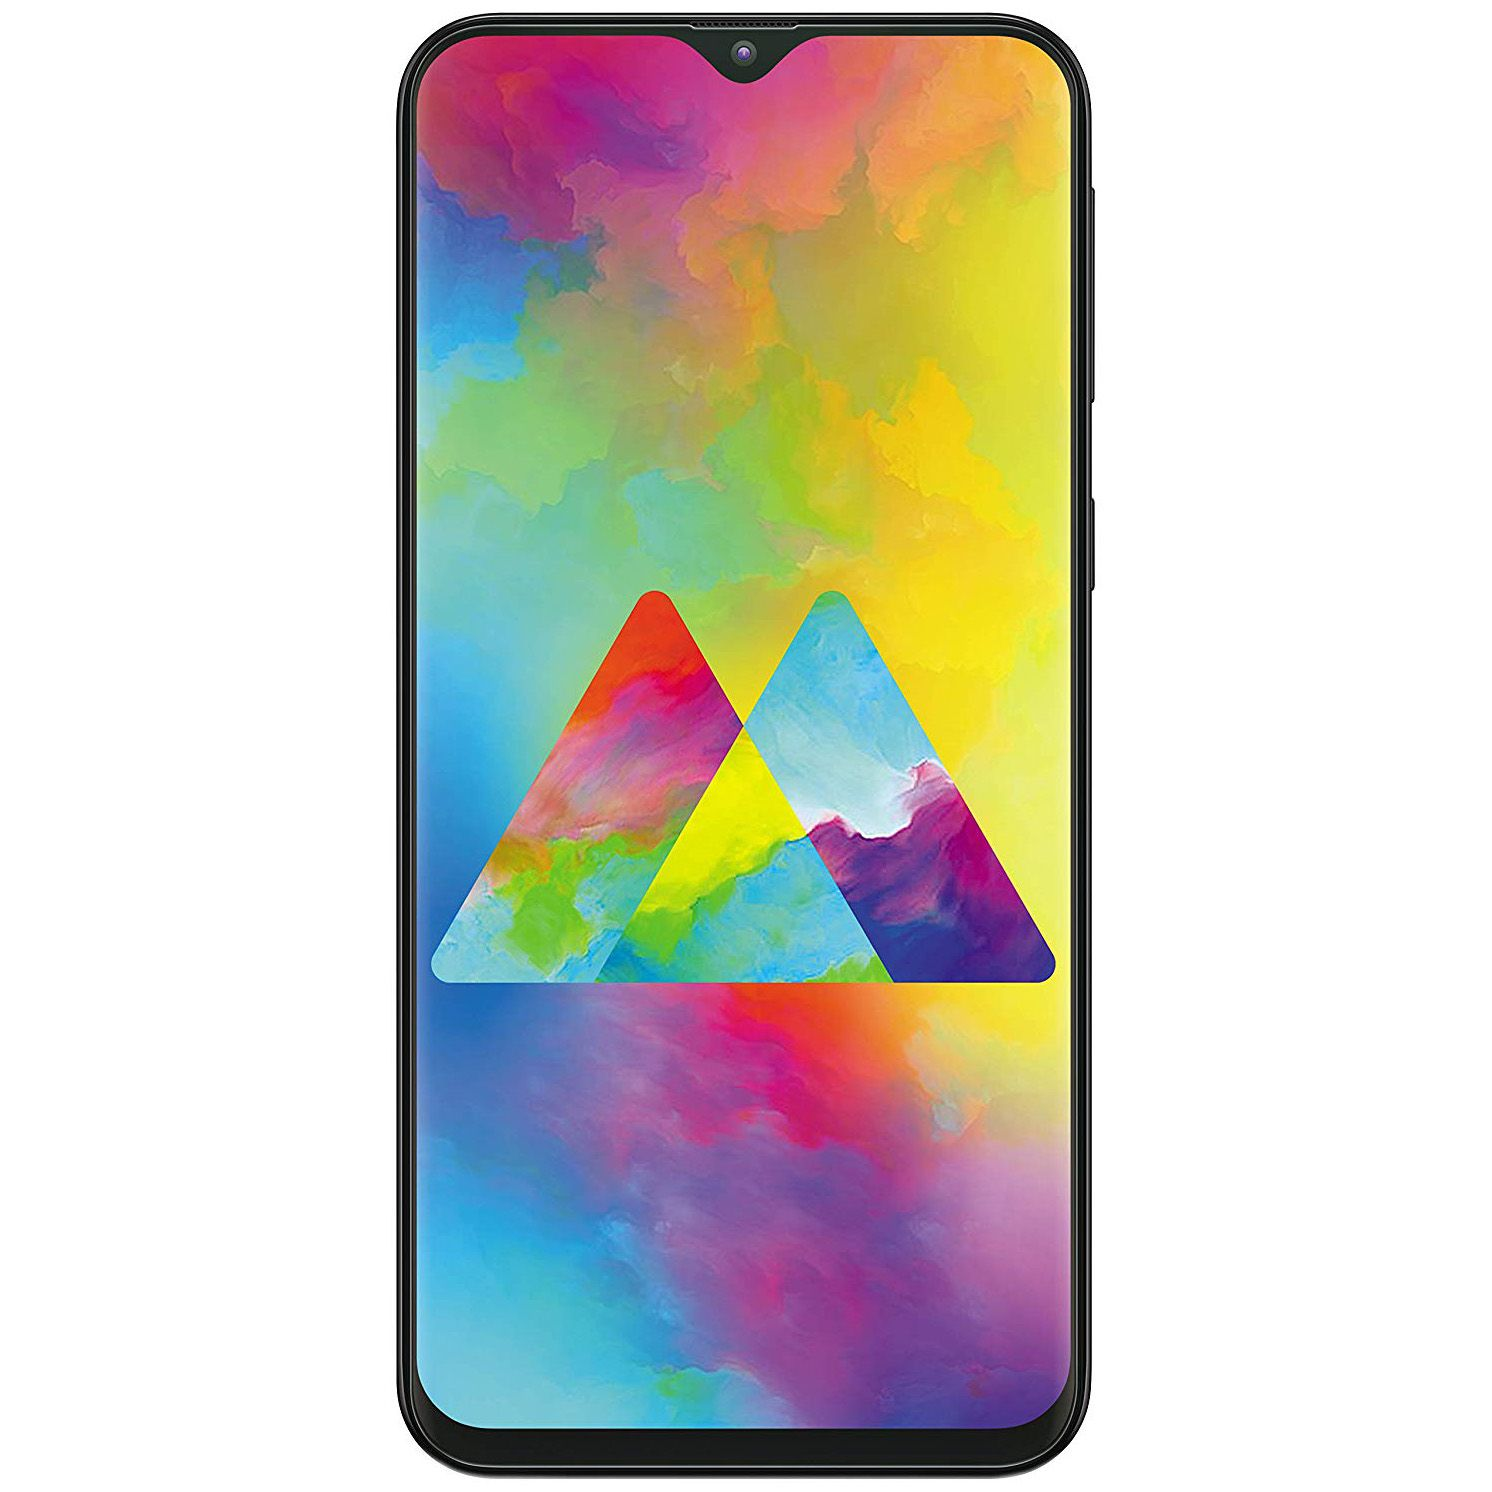 Telefon mobil Samsung Galaxy M20, Dual SIM, 64GB, 4GB RAM, 4G, Charcoal Black